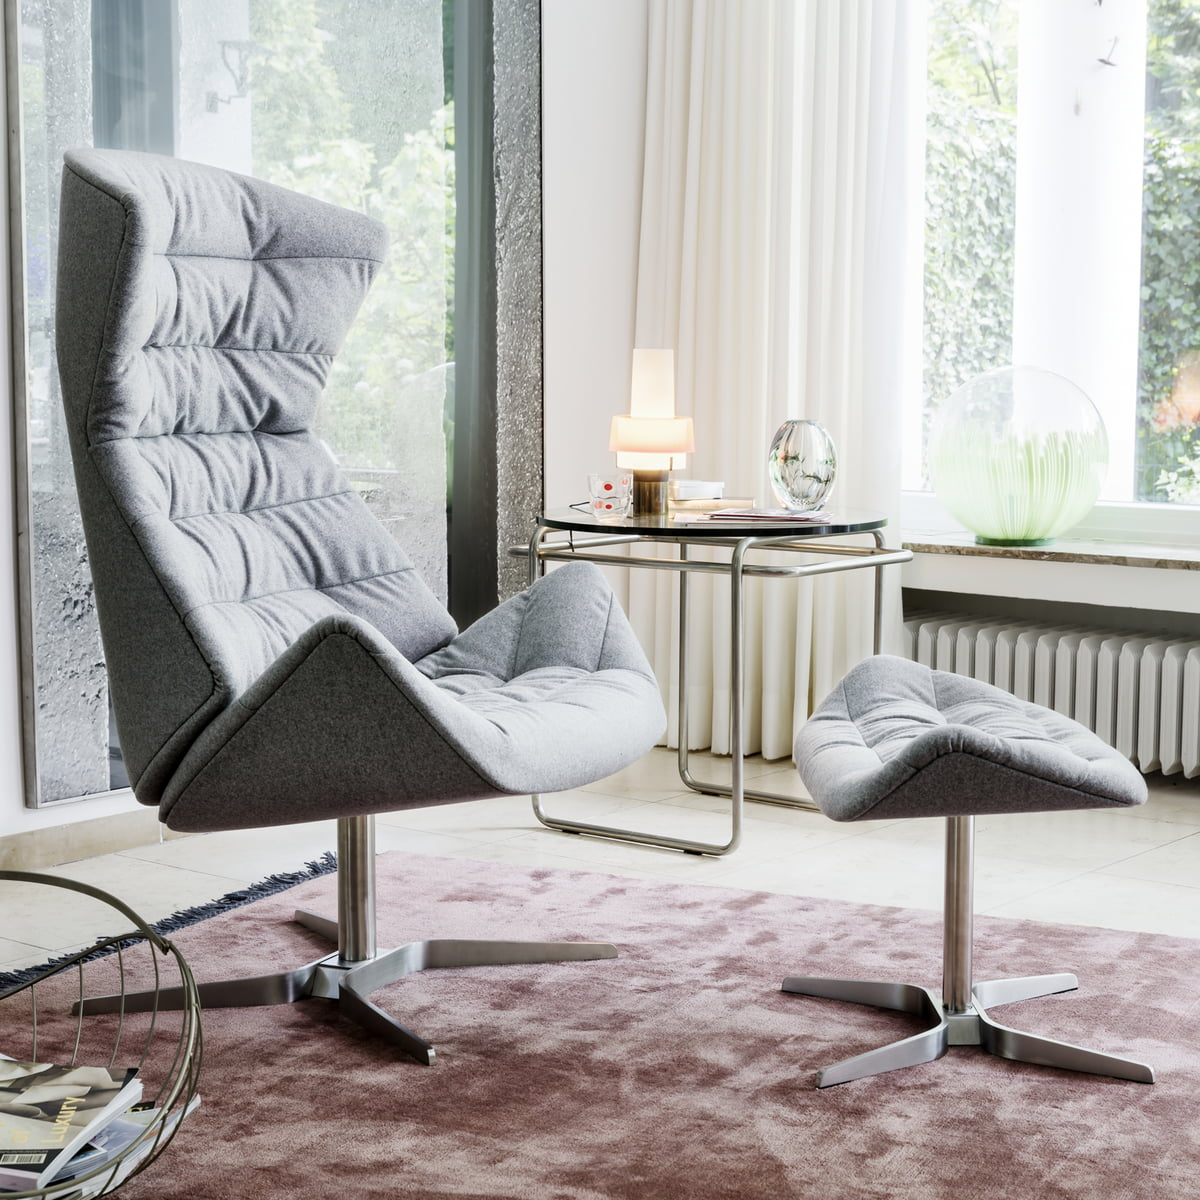 808 Lounge Sessel Von Thonet Connox